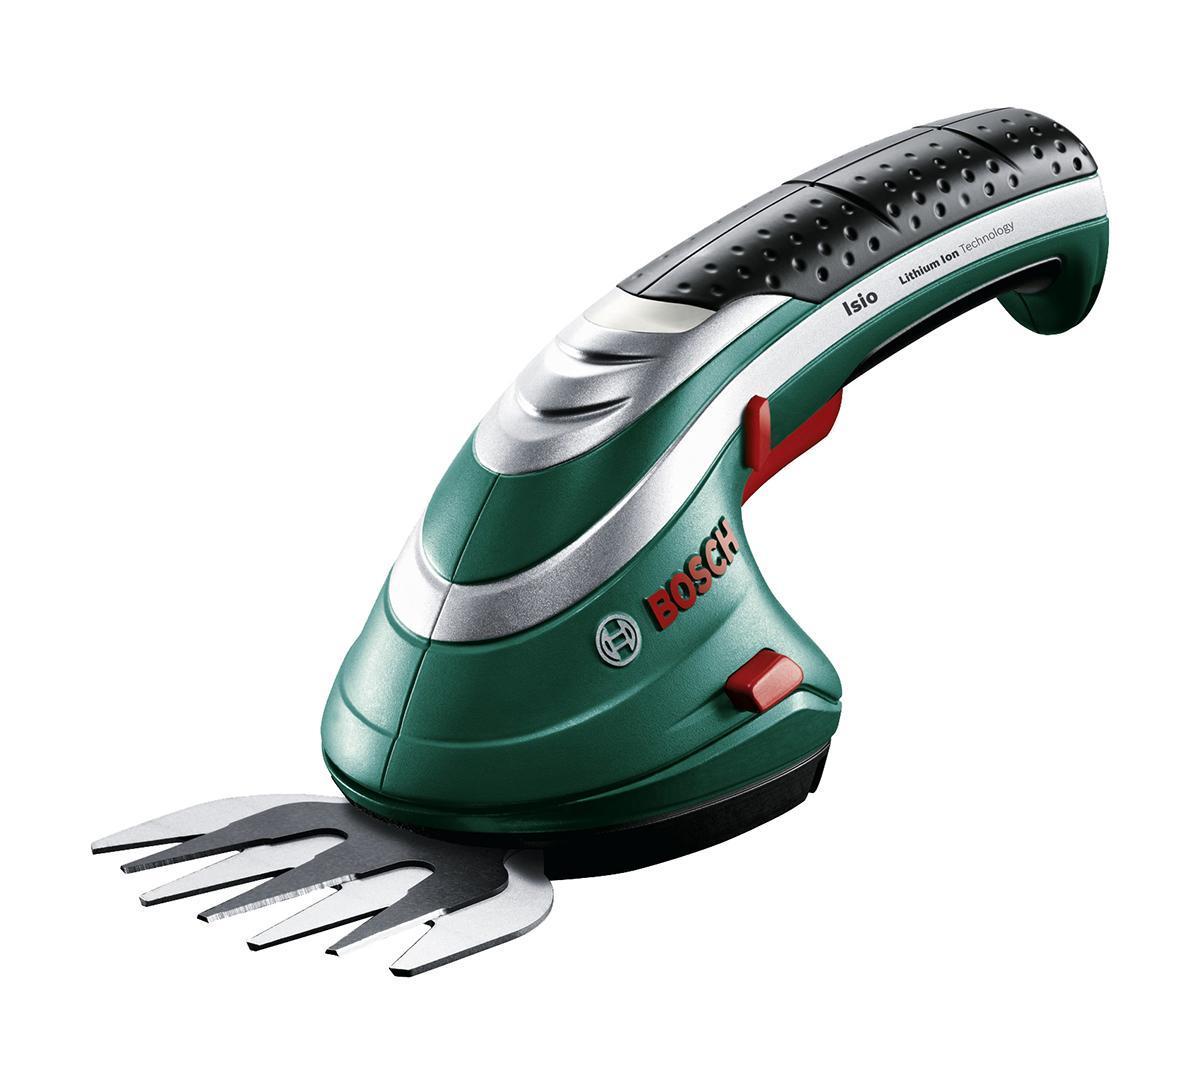 Аккумуляторные ножницы для травы Bosch ISIO 3 + чехол 0600833100 bosch isio 3 060083310 g